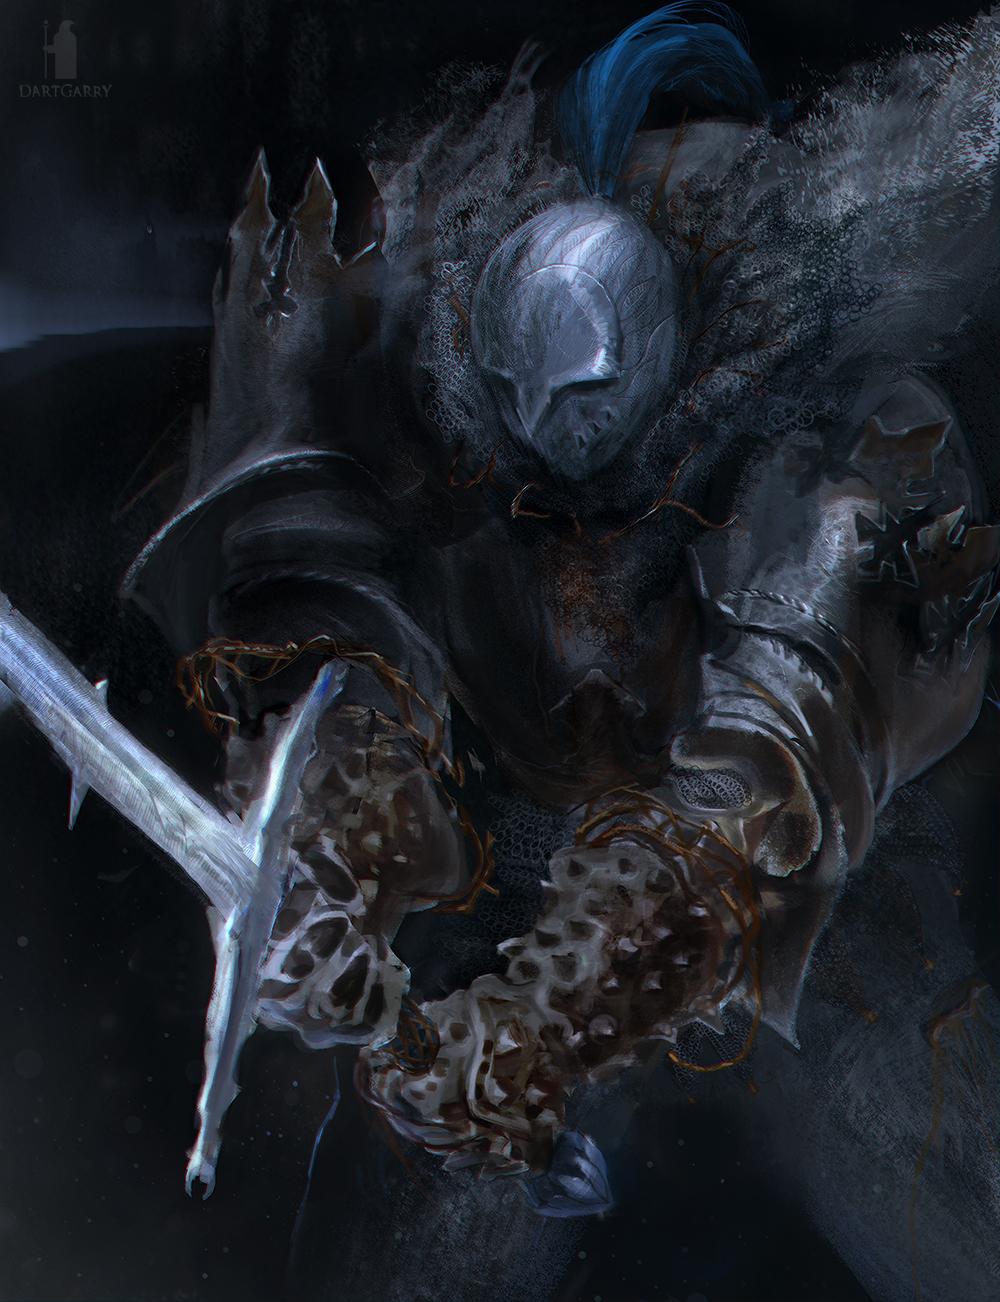 dark_souls_dartgarry_by_dartgarry-d7beg6l.jpg